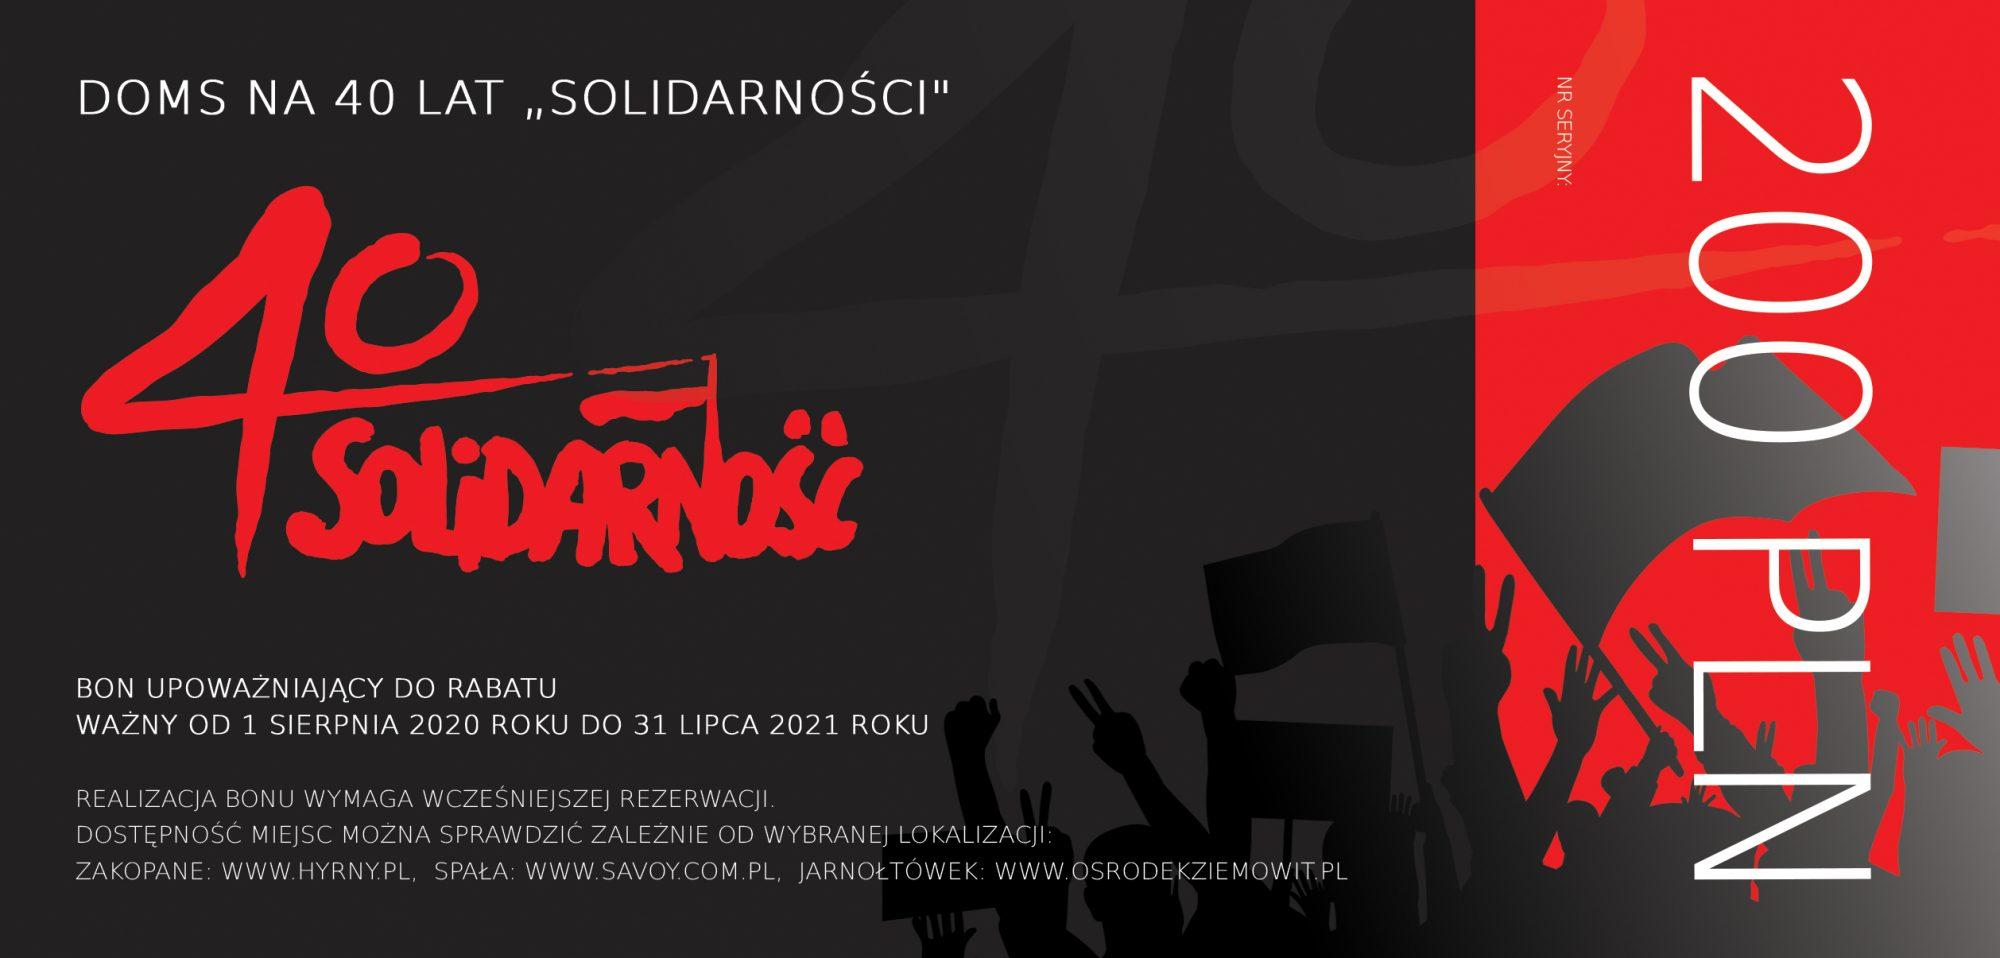 solidarnosc